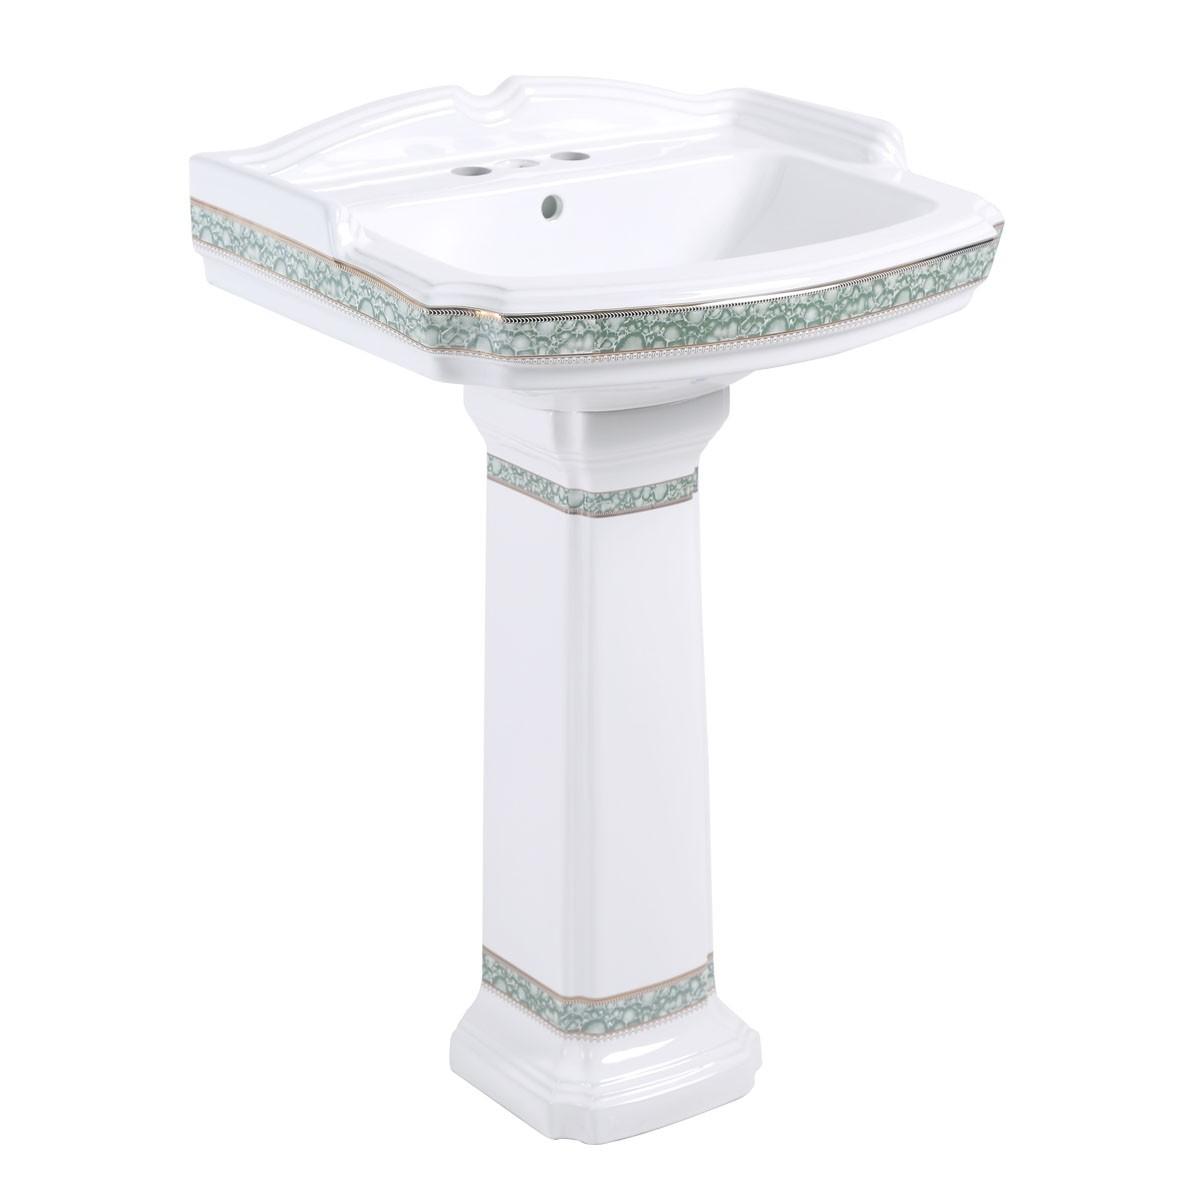 Etonnant ... U003cPREu003eIndia Reserve Bathroom Pedestal Sink White Porcelain Green And  Gold Rensupu003c/ ...